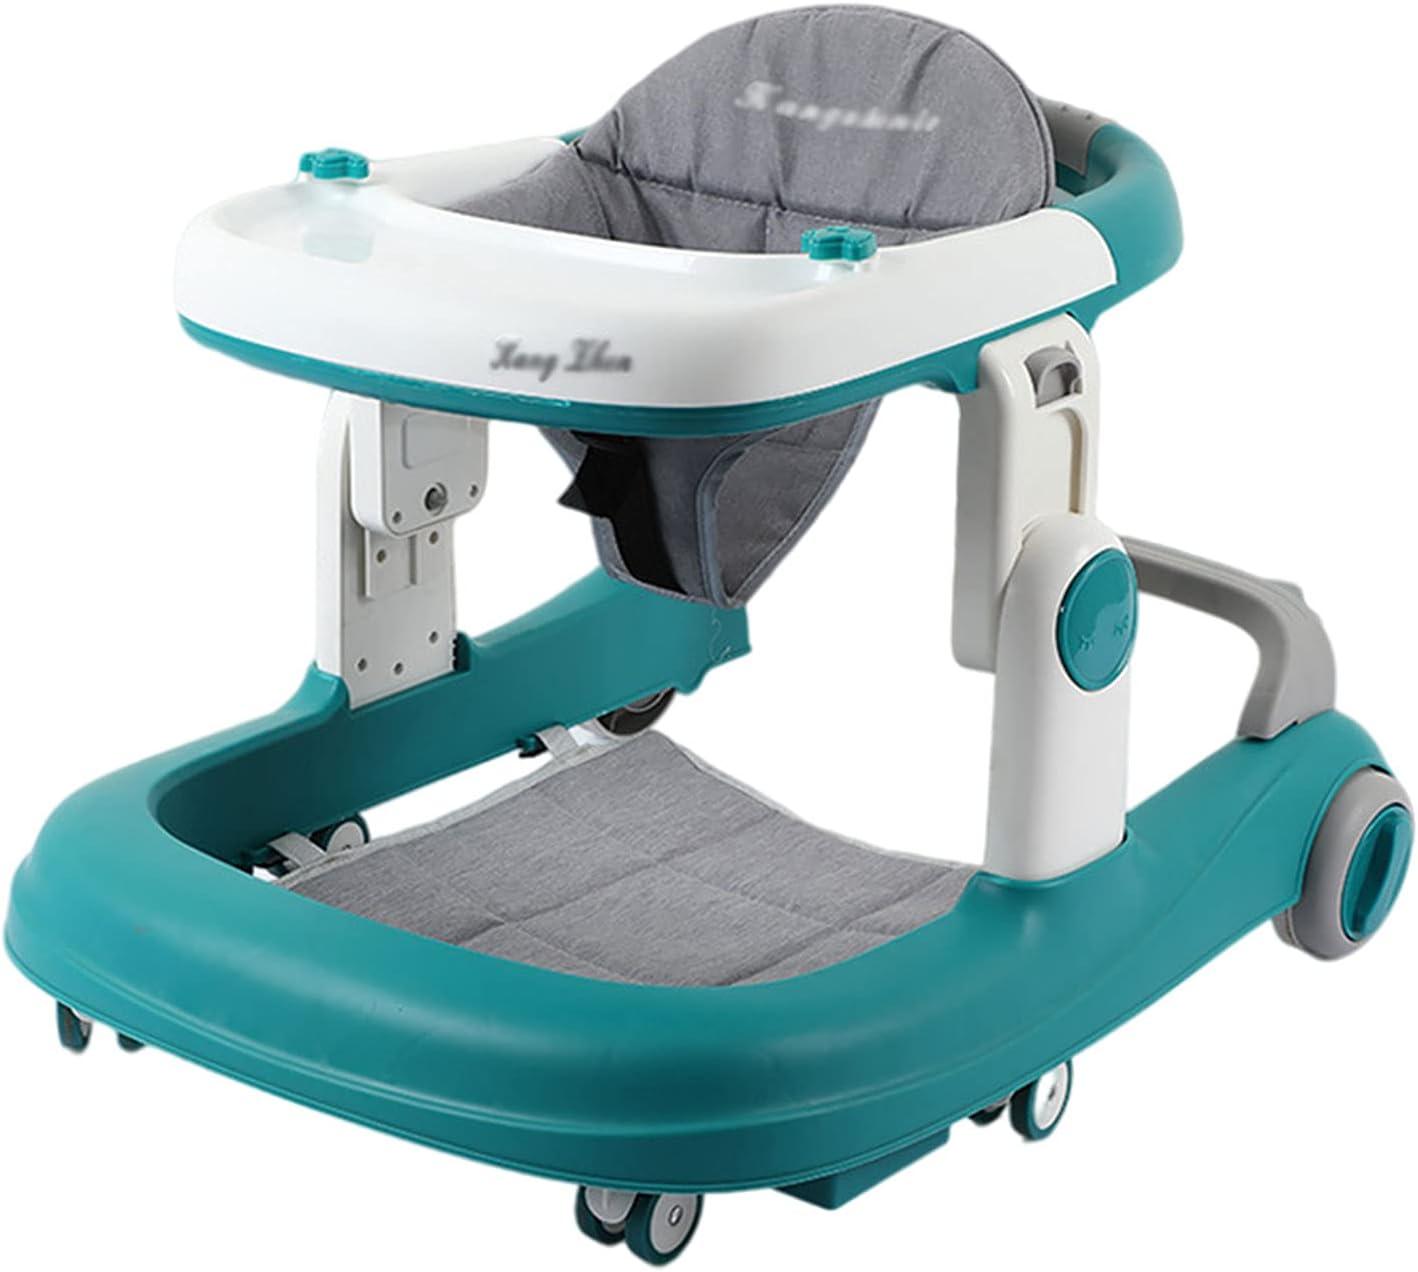 FPKK Baby Multifunctional Anti-Rollover Wheel Finally resale start Foldable Silent Gi low-pricing